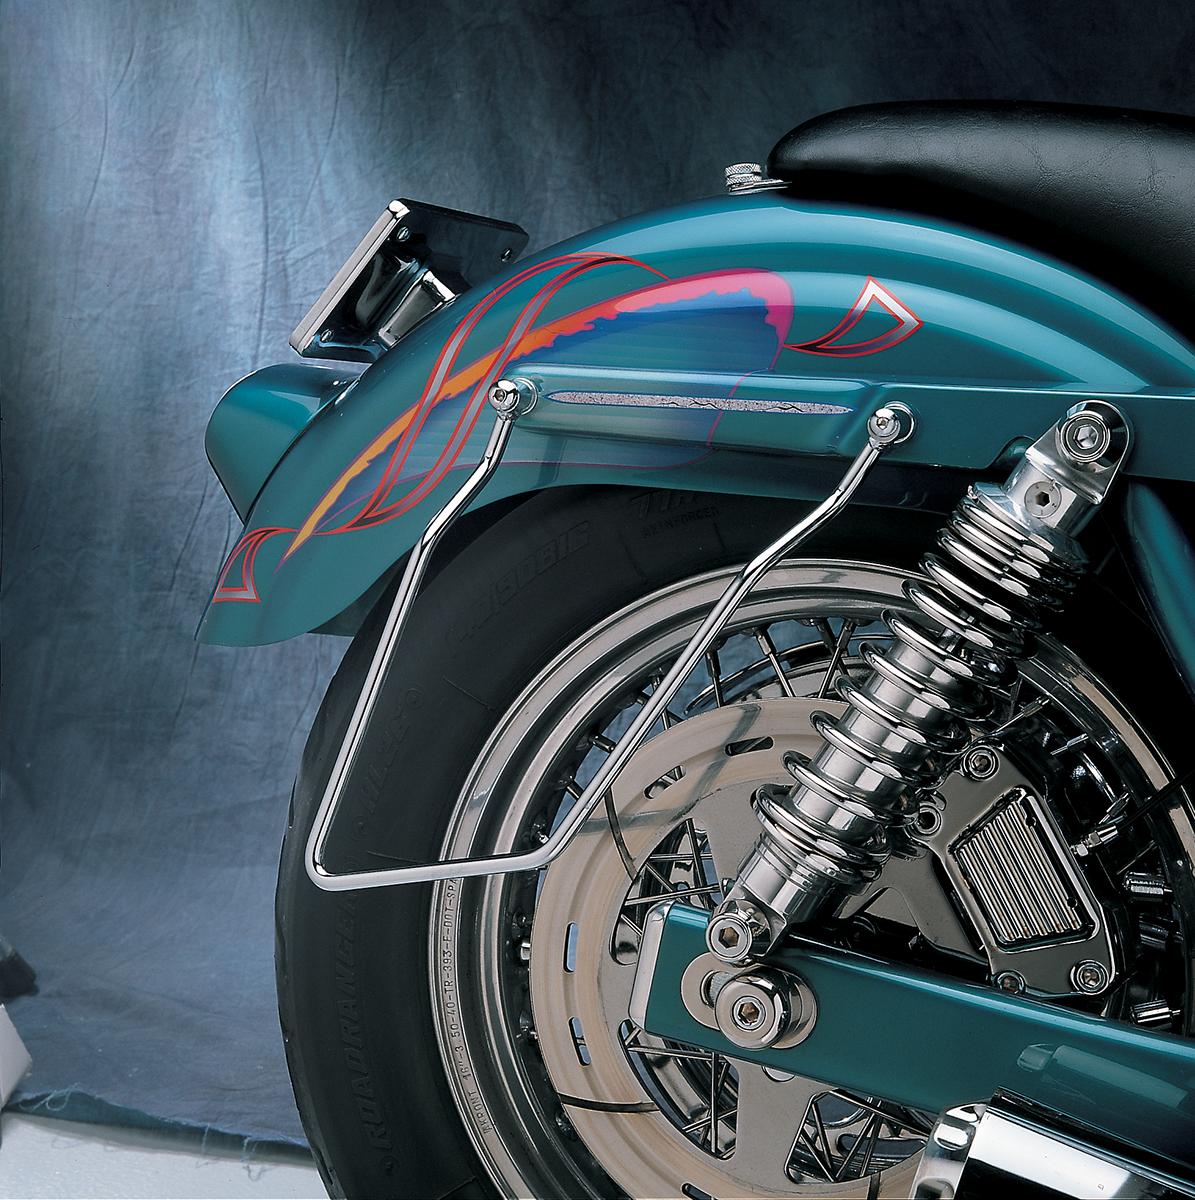 Drag Specialties Chrome Rear Saddlebag Support Brackets for 82-00 Harley FXR